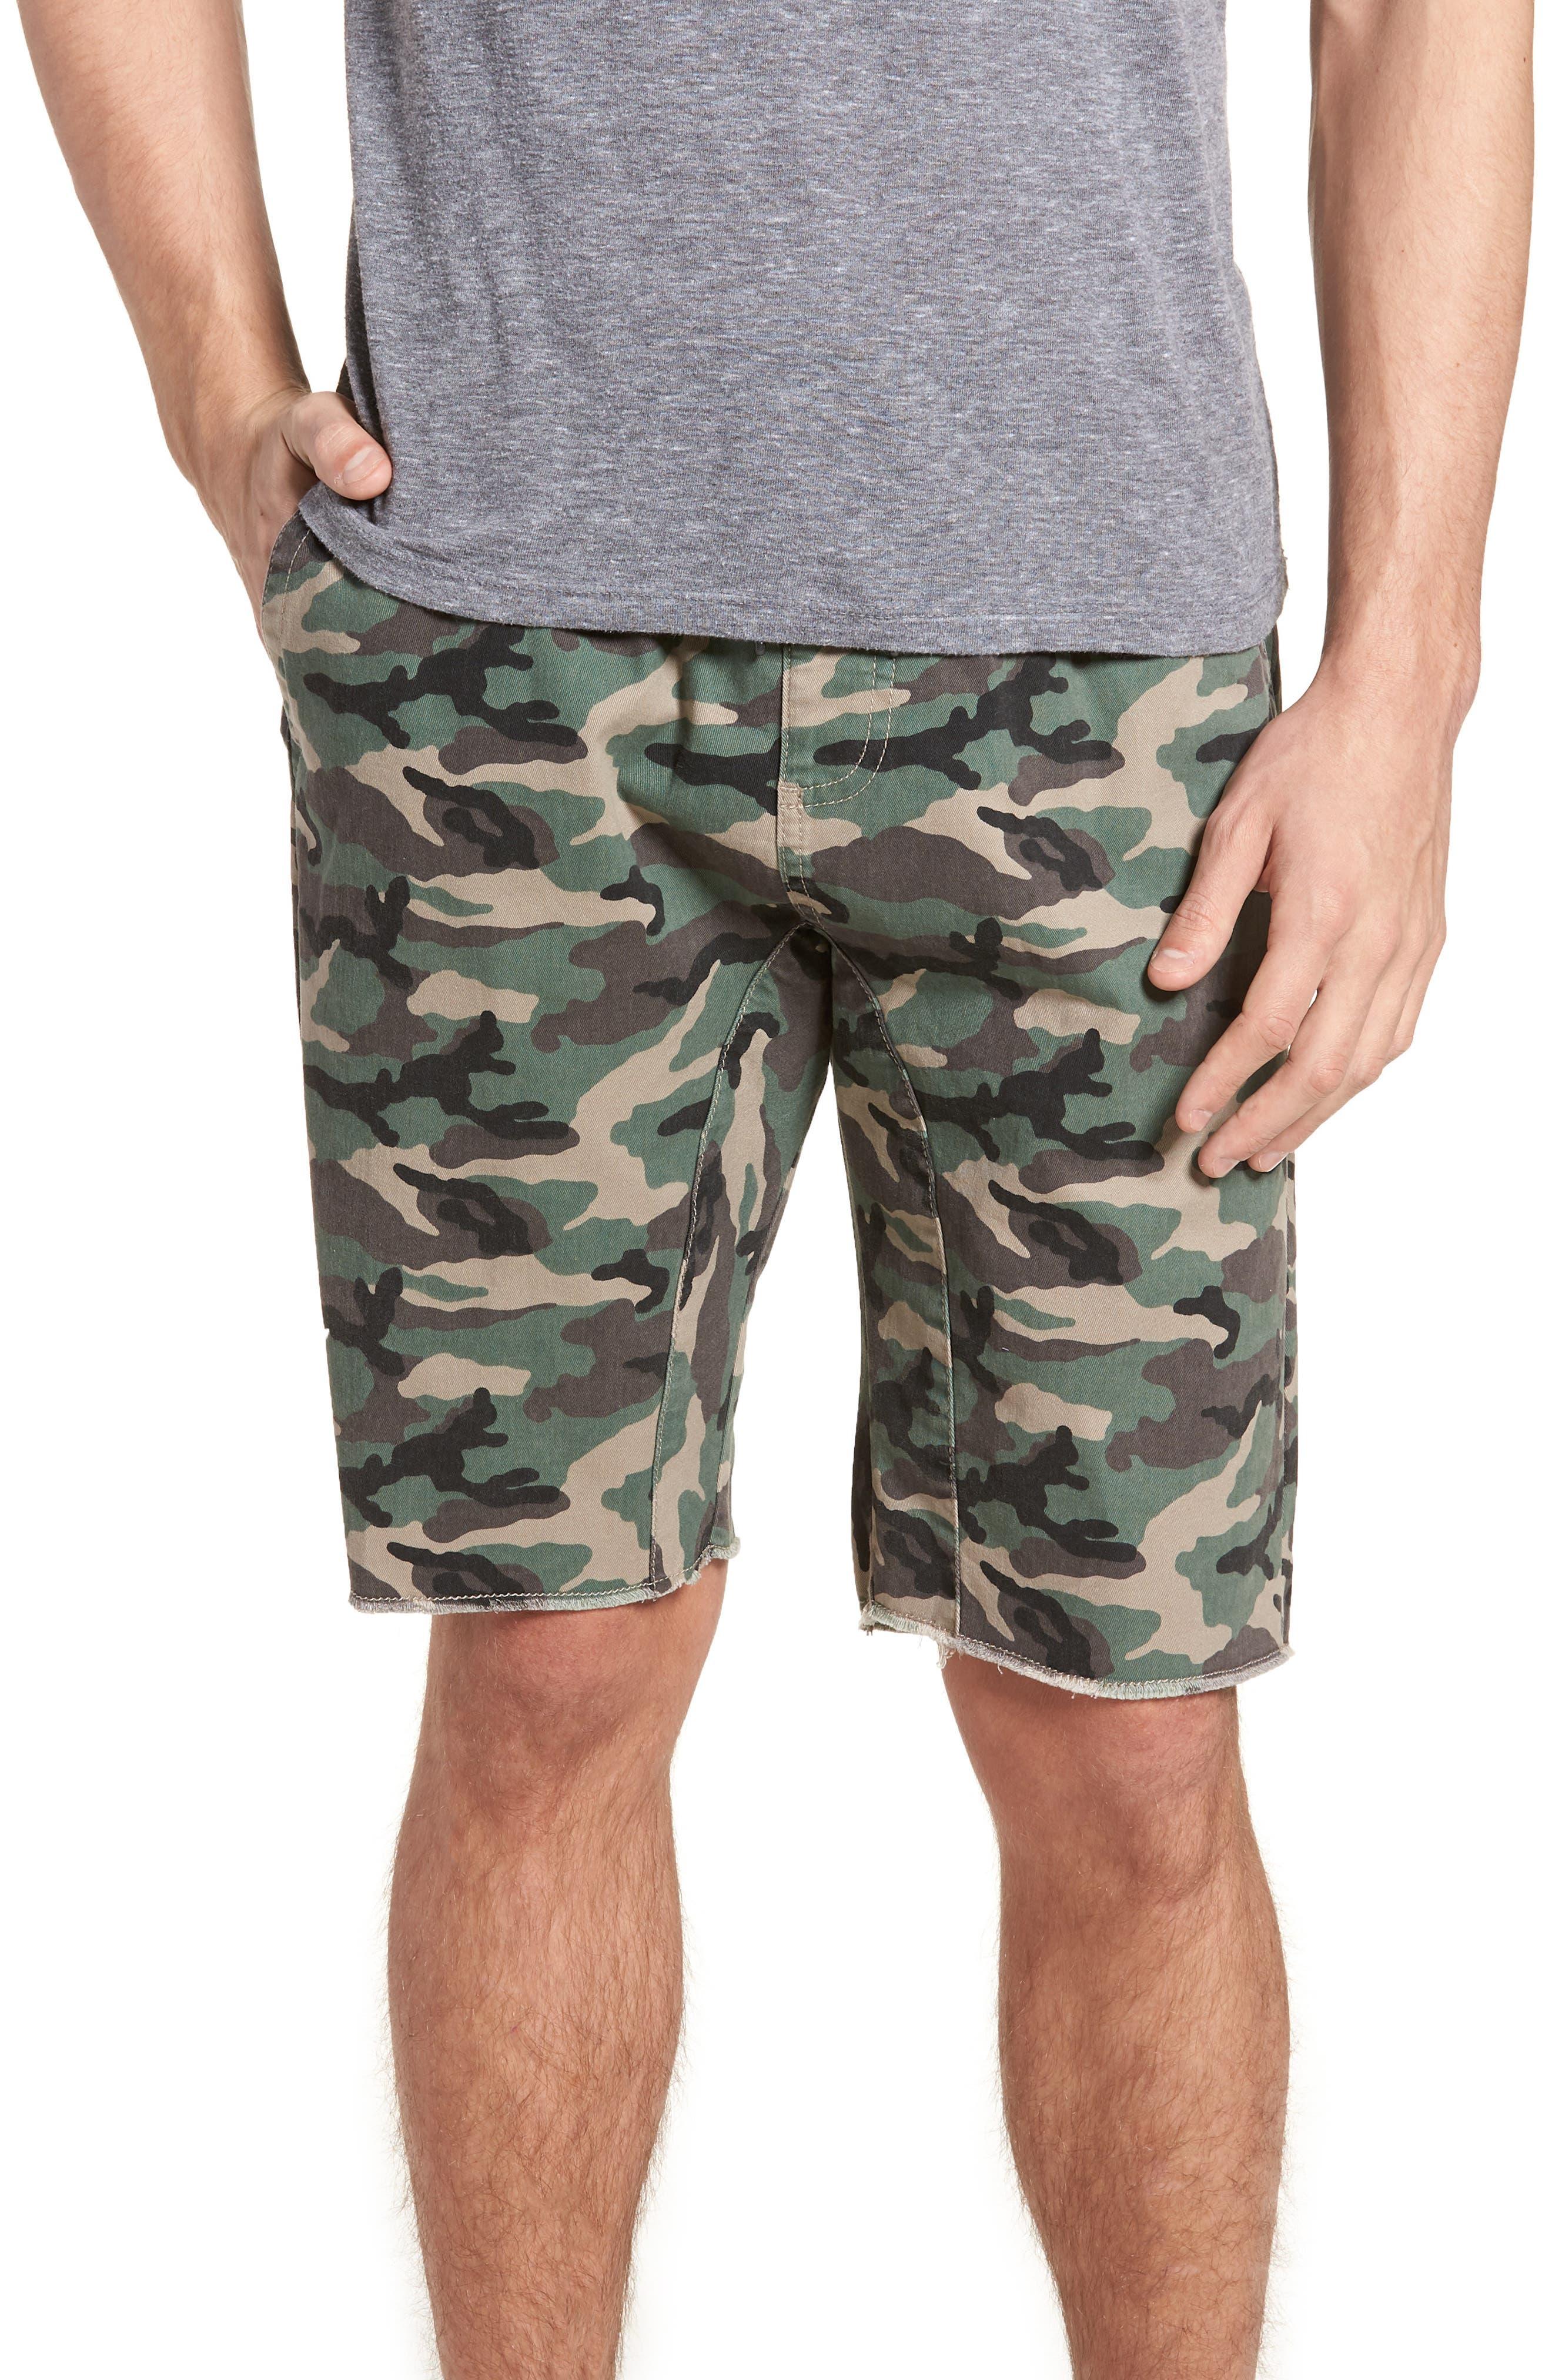 THE RAIL Camo Print Cutoff Twill Shorts, Main, color, BROWN GREEN CAMO